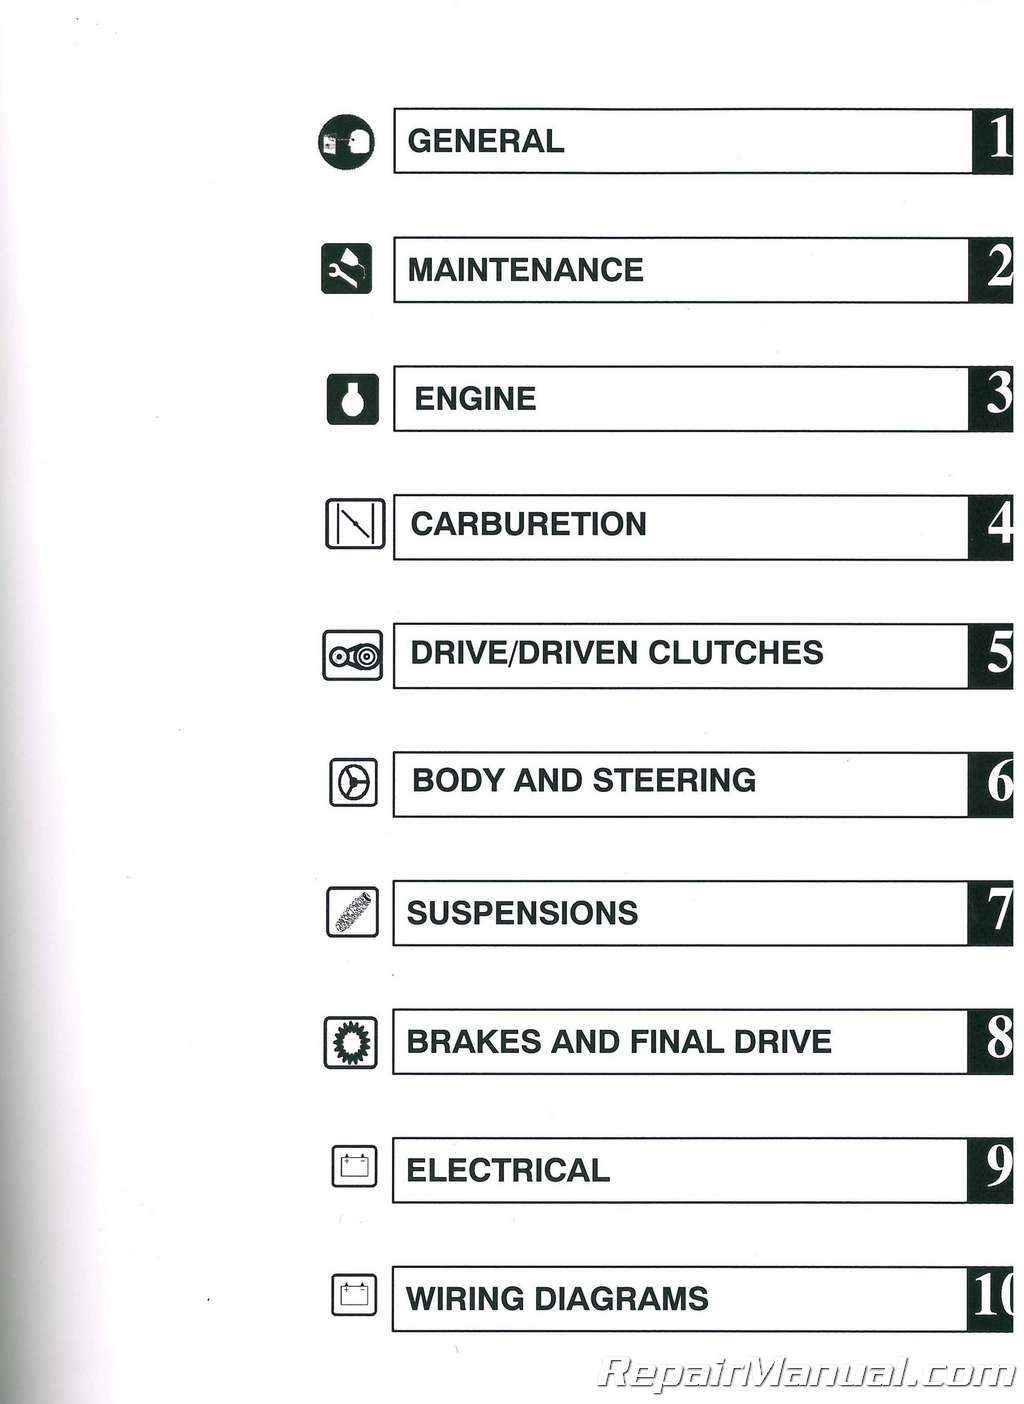 hight resolution of 2002 polaris xc sp and xcr performance snowmobile service manual 2002 polaris xcsp 600 wiring diagram